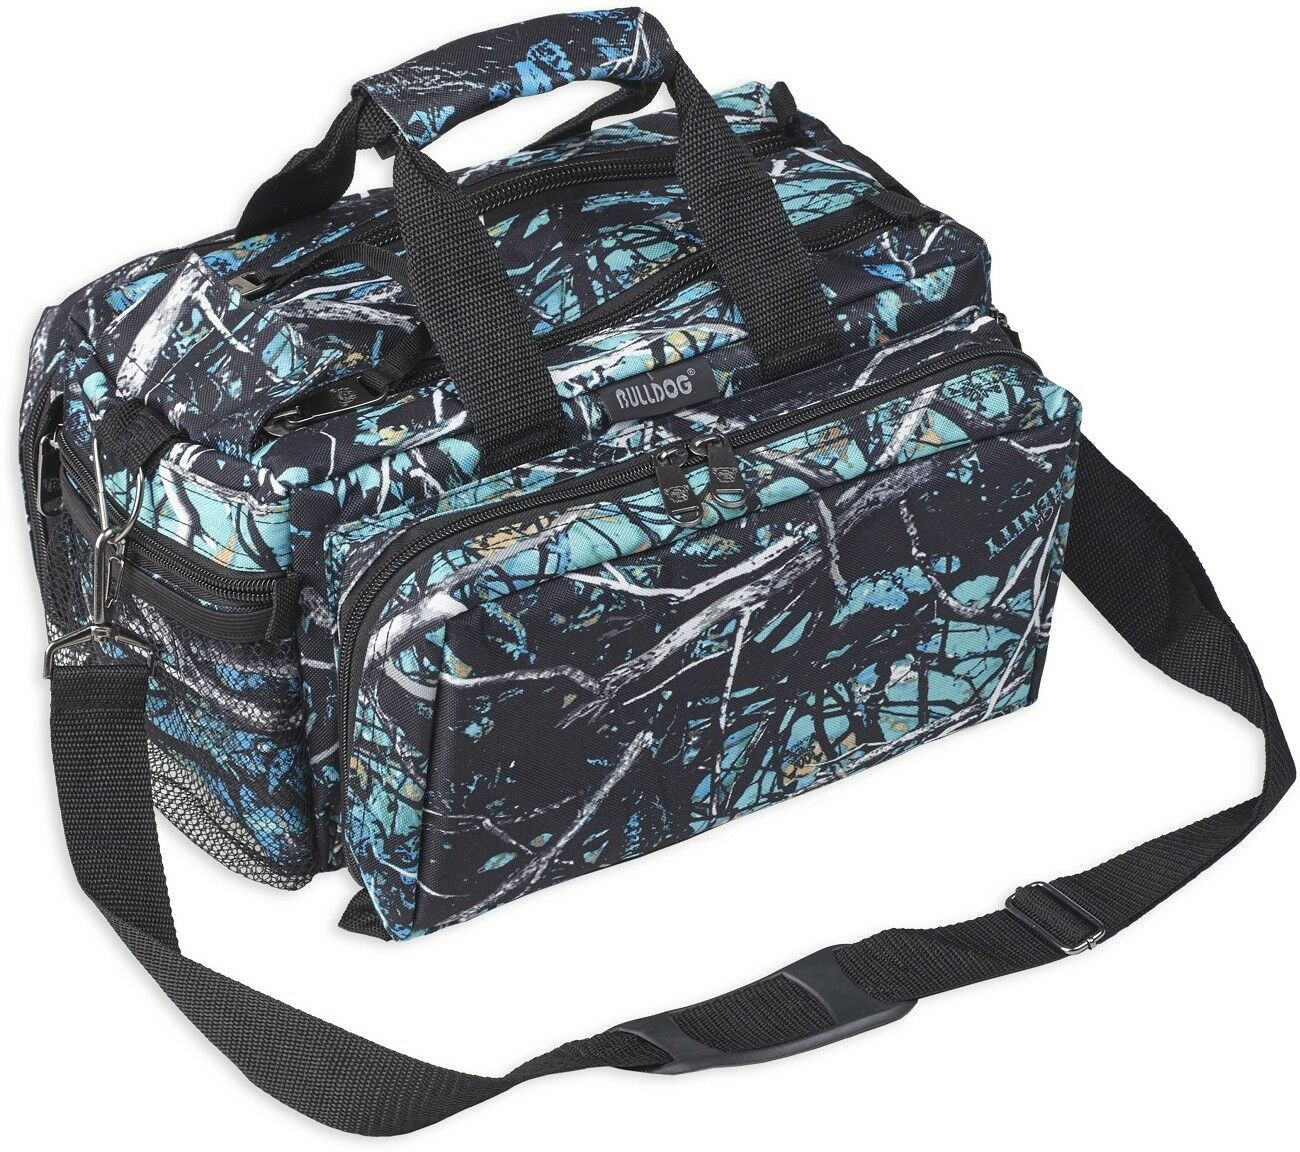 Muddy Girl Serenity Deluxe Range Bag, Nylon Camouflage Bulldog Cases BD910SRN